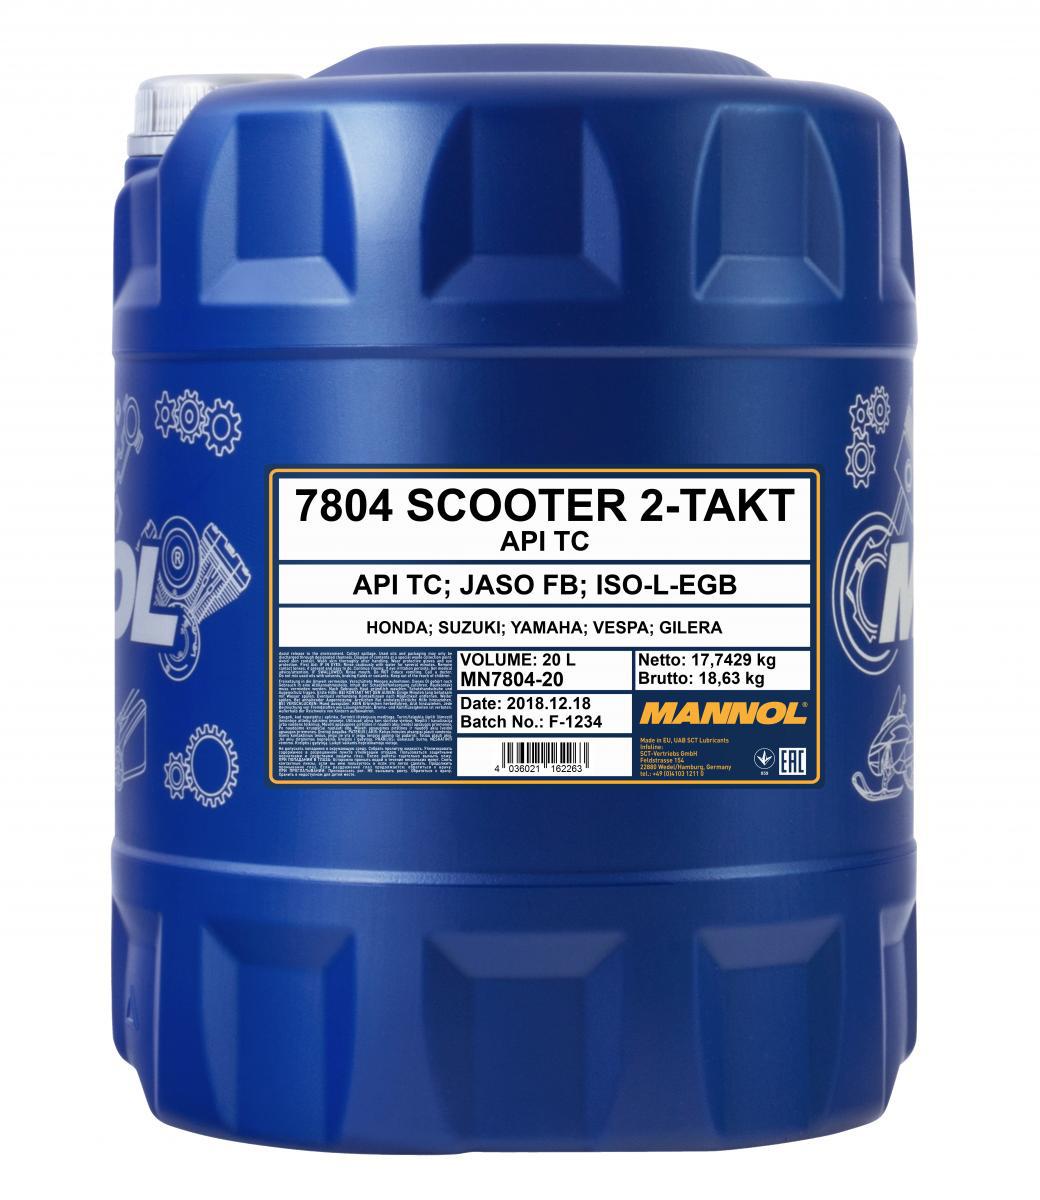 Scooter 2-Takt